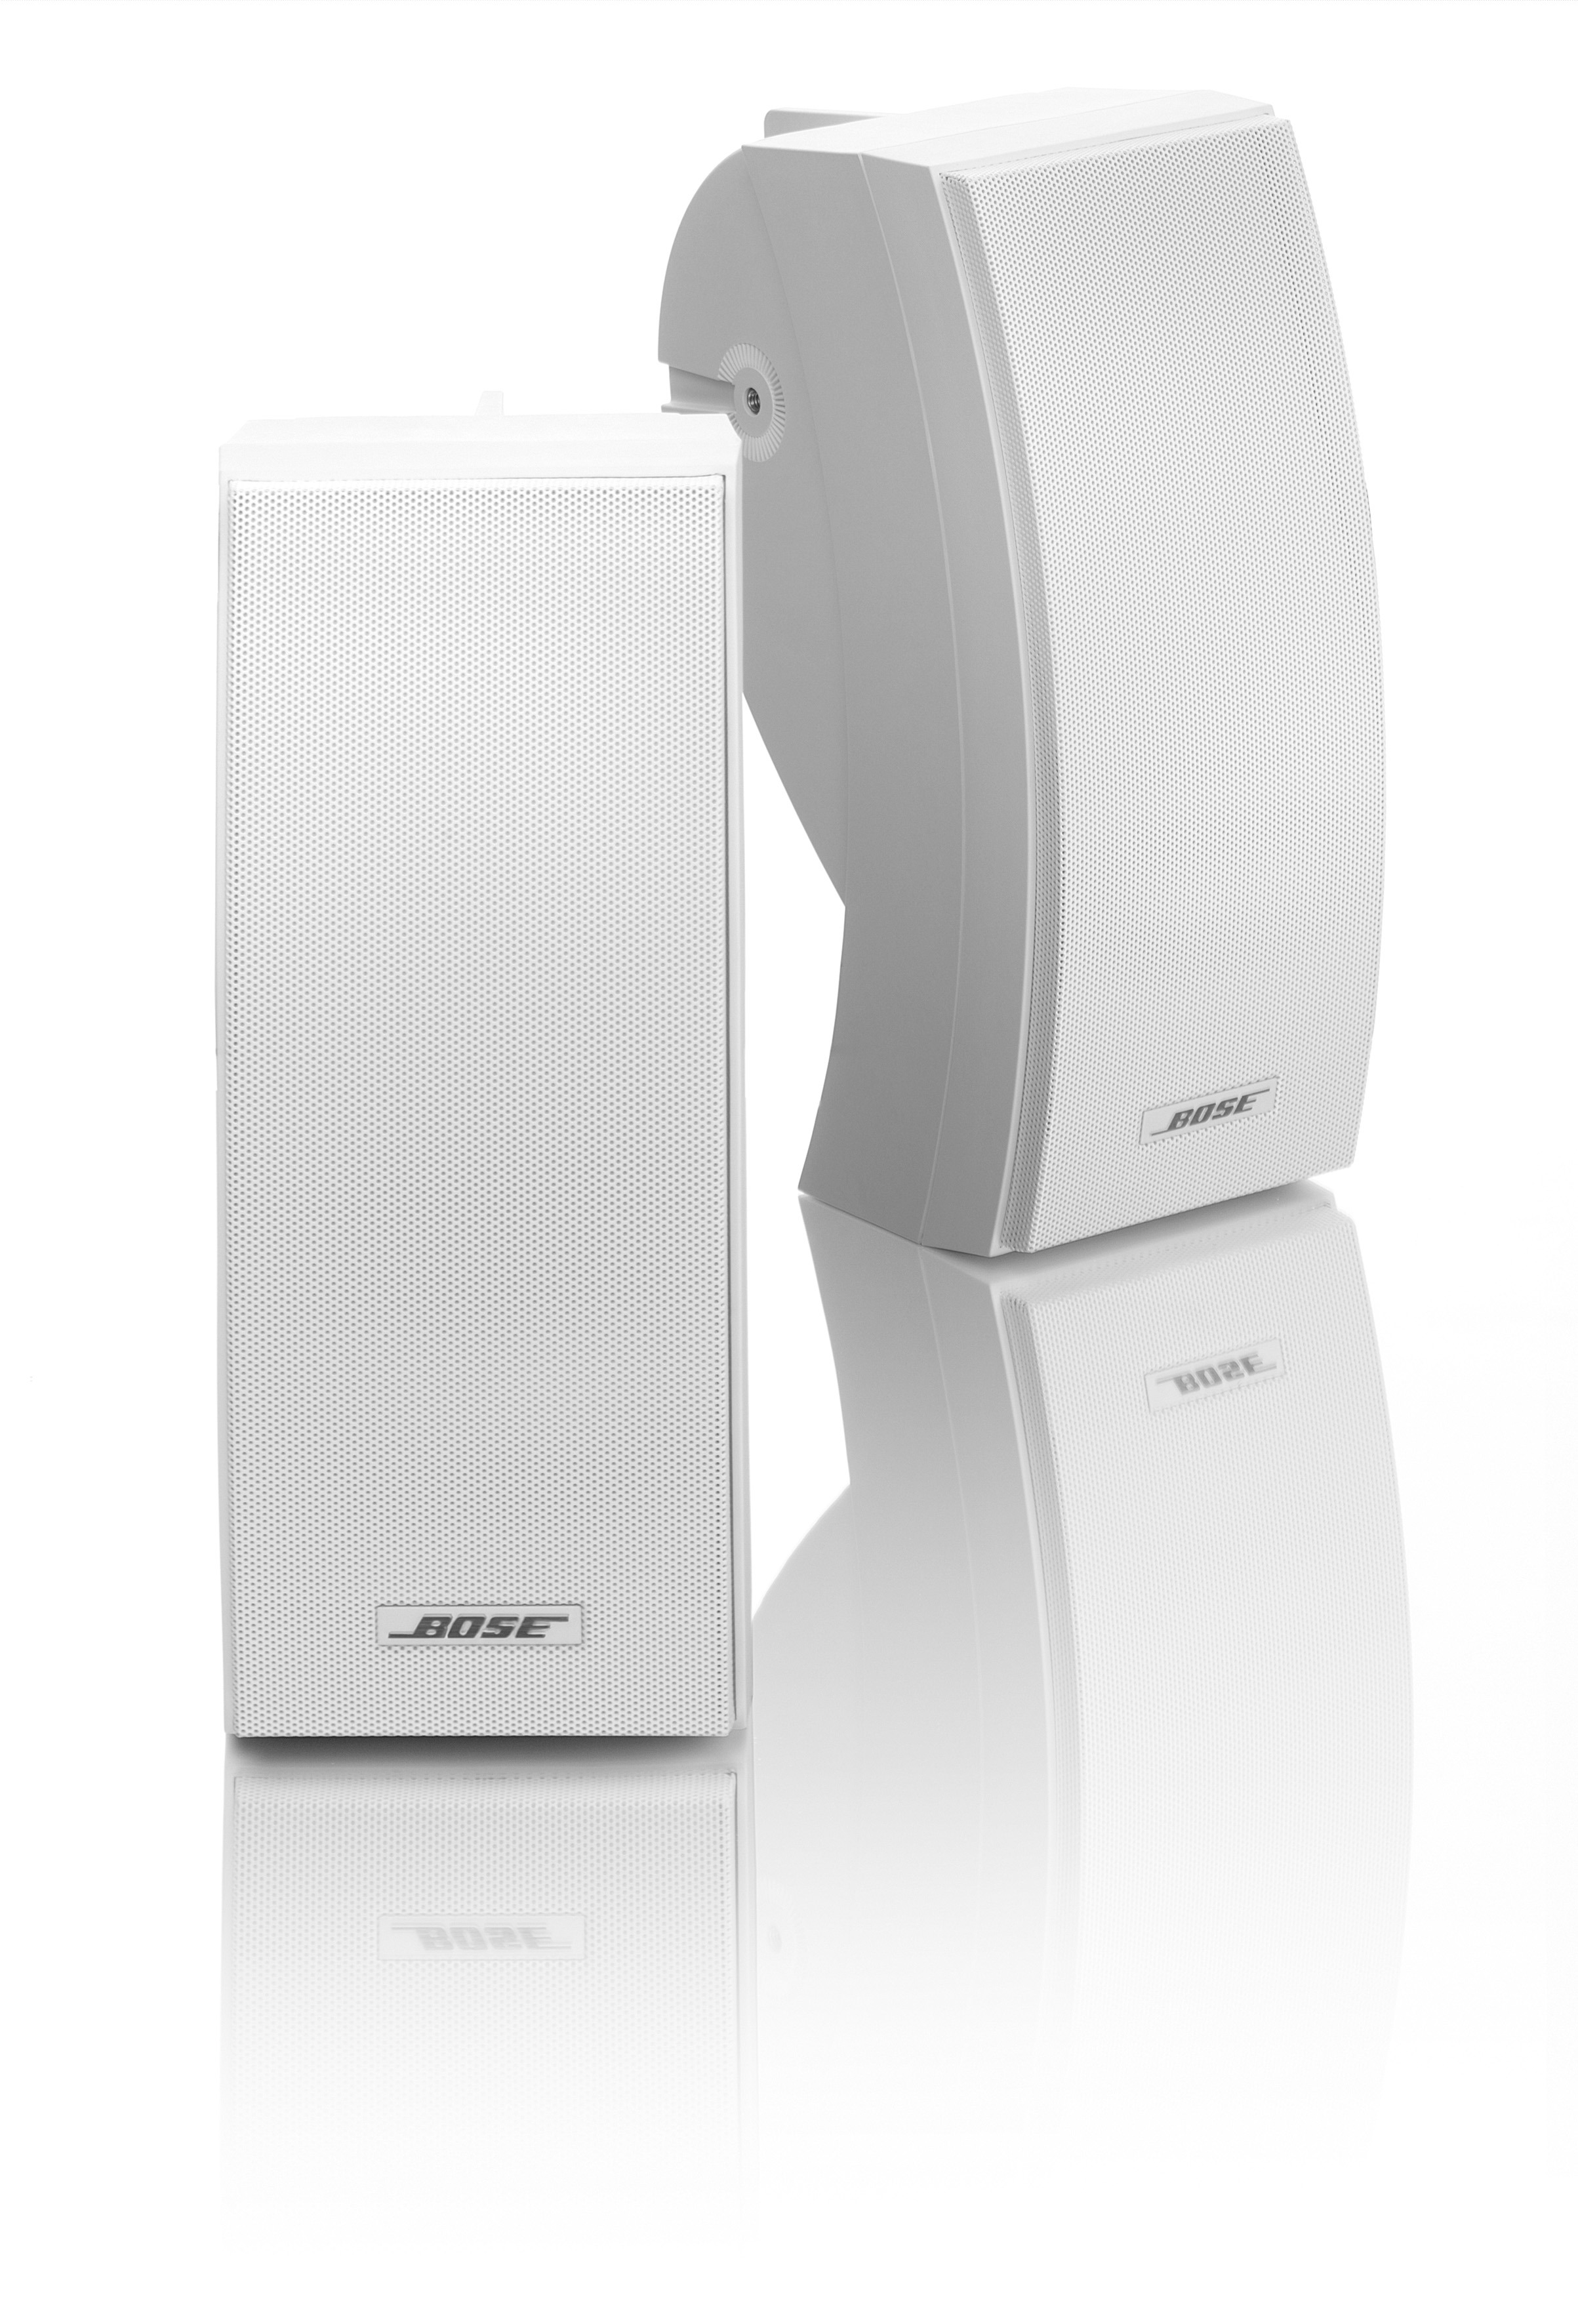 Bose boekenplank speaker 251 Environmental speaker - (including brackets) wit